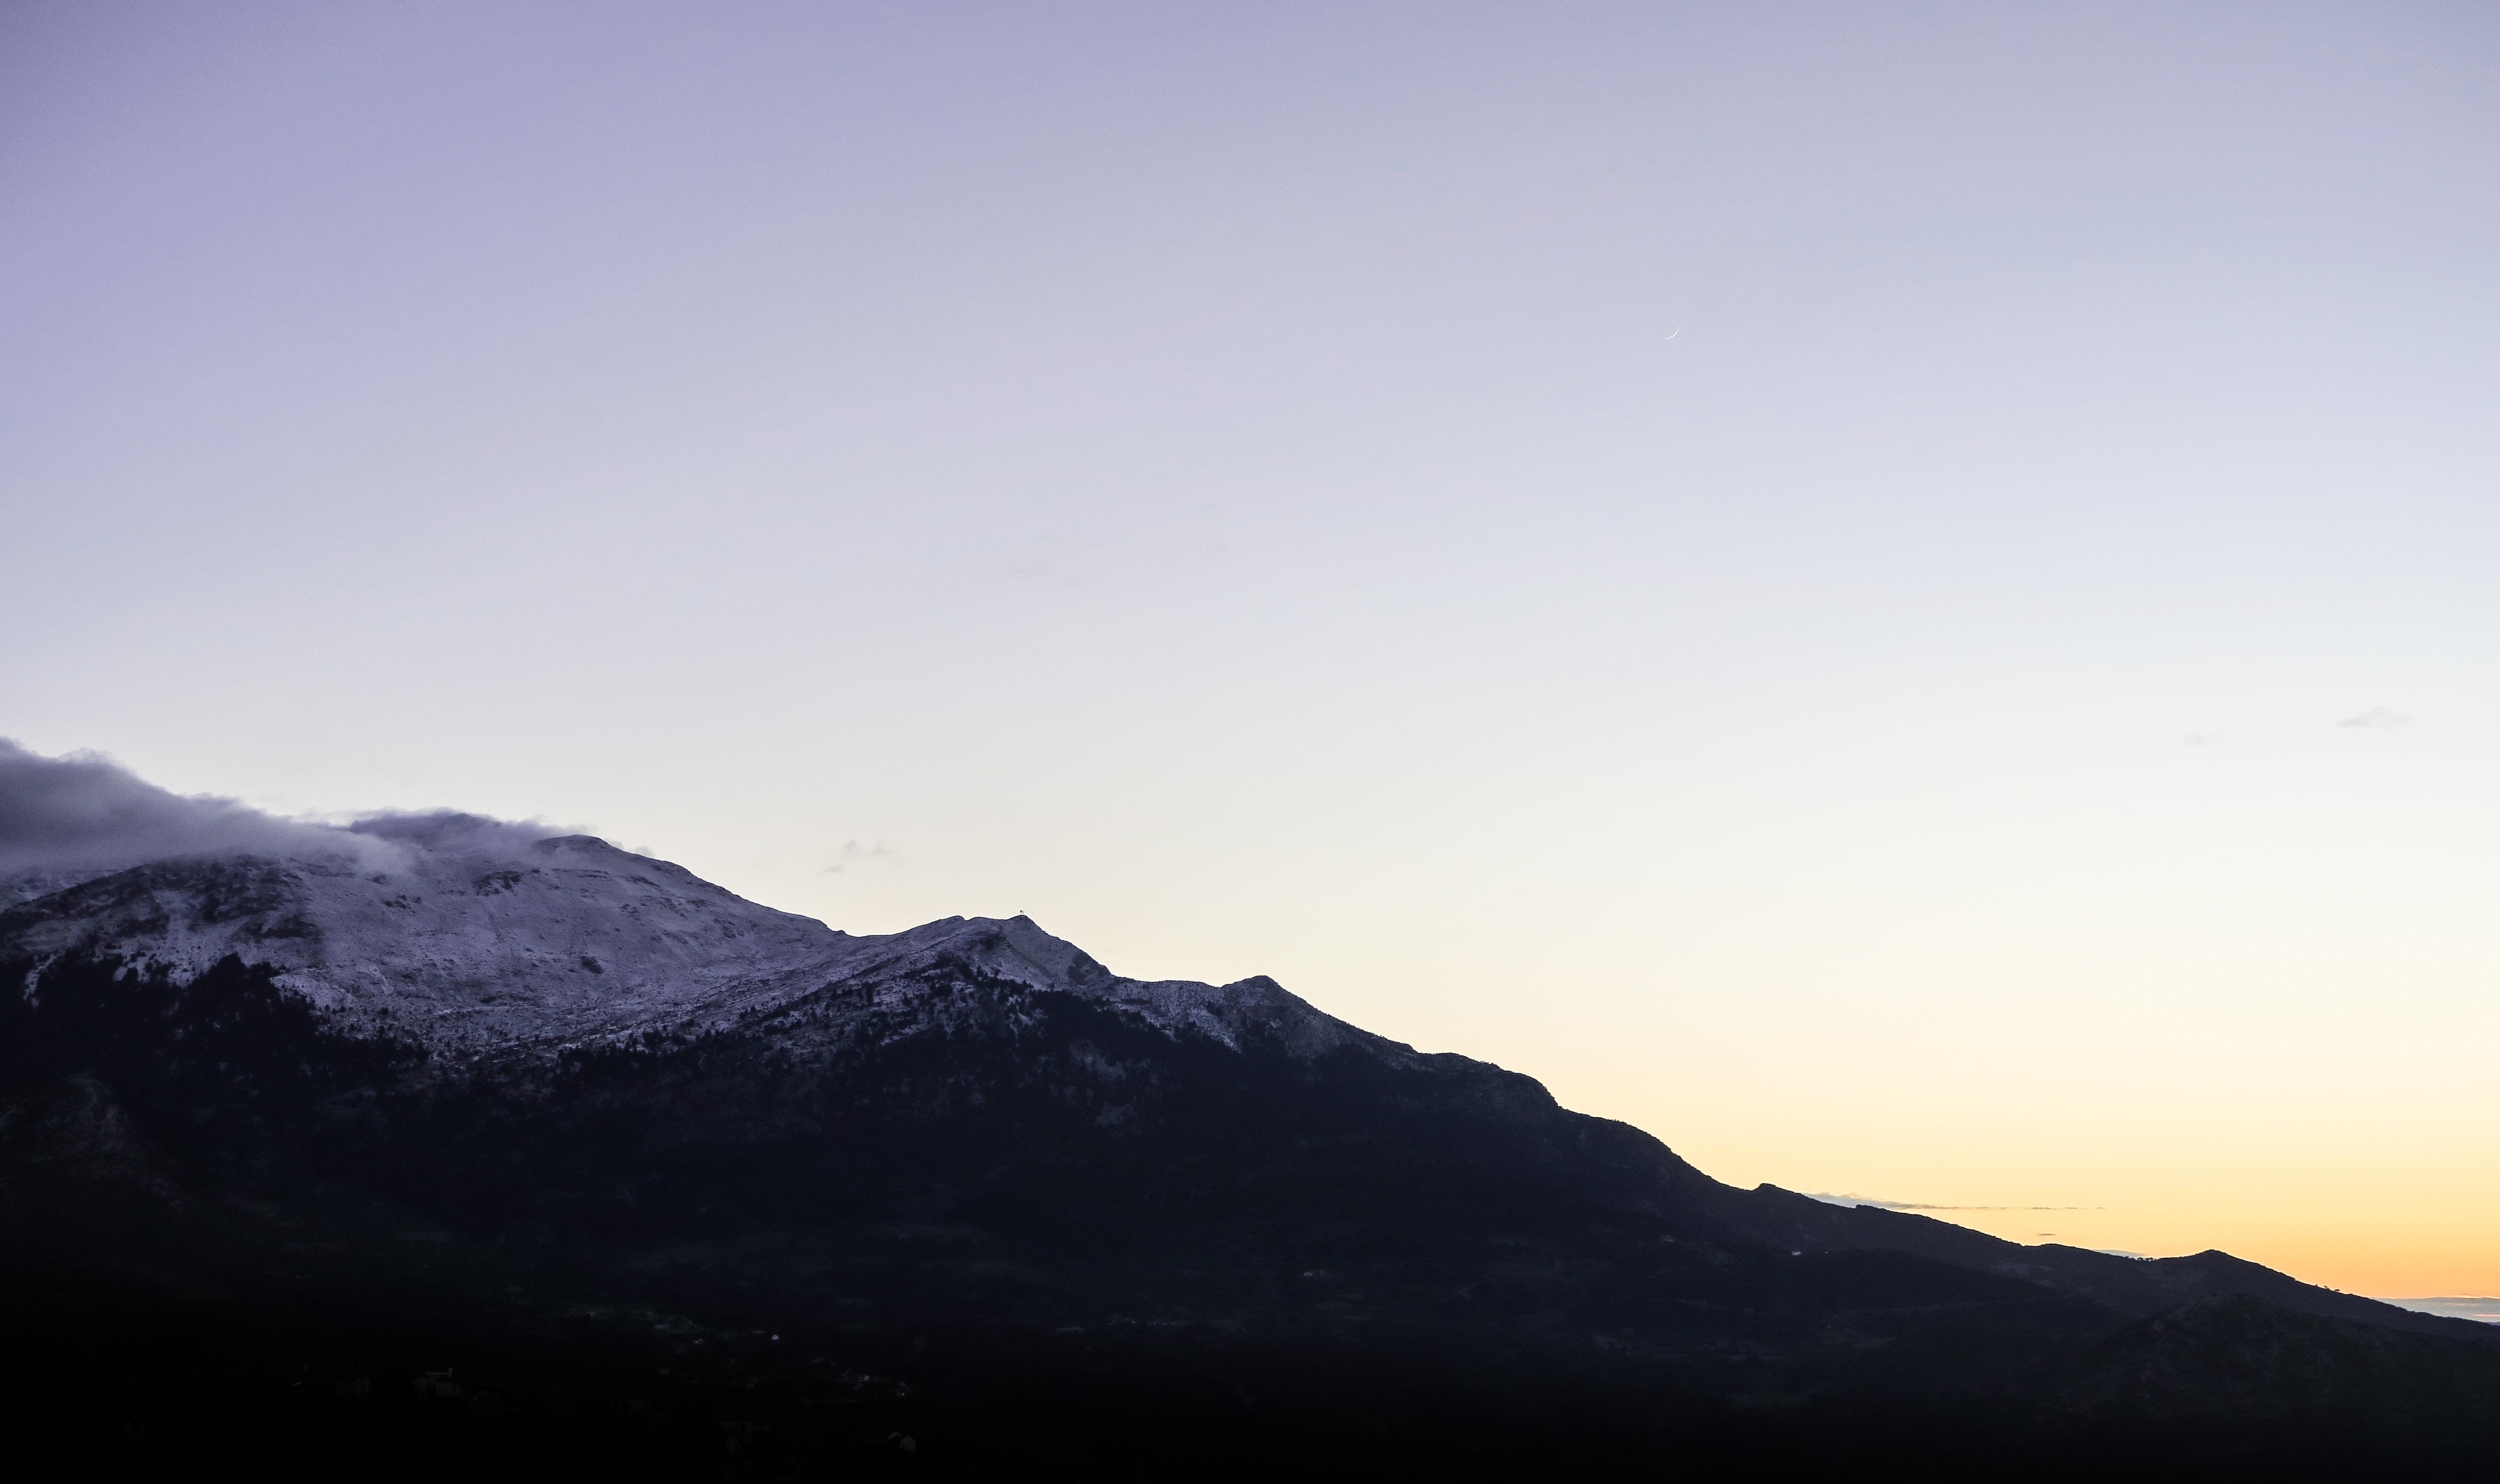 A dim shot of a long mountain ridge during sunset